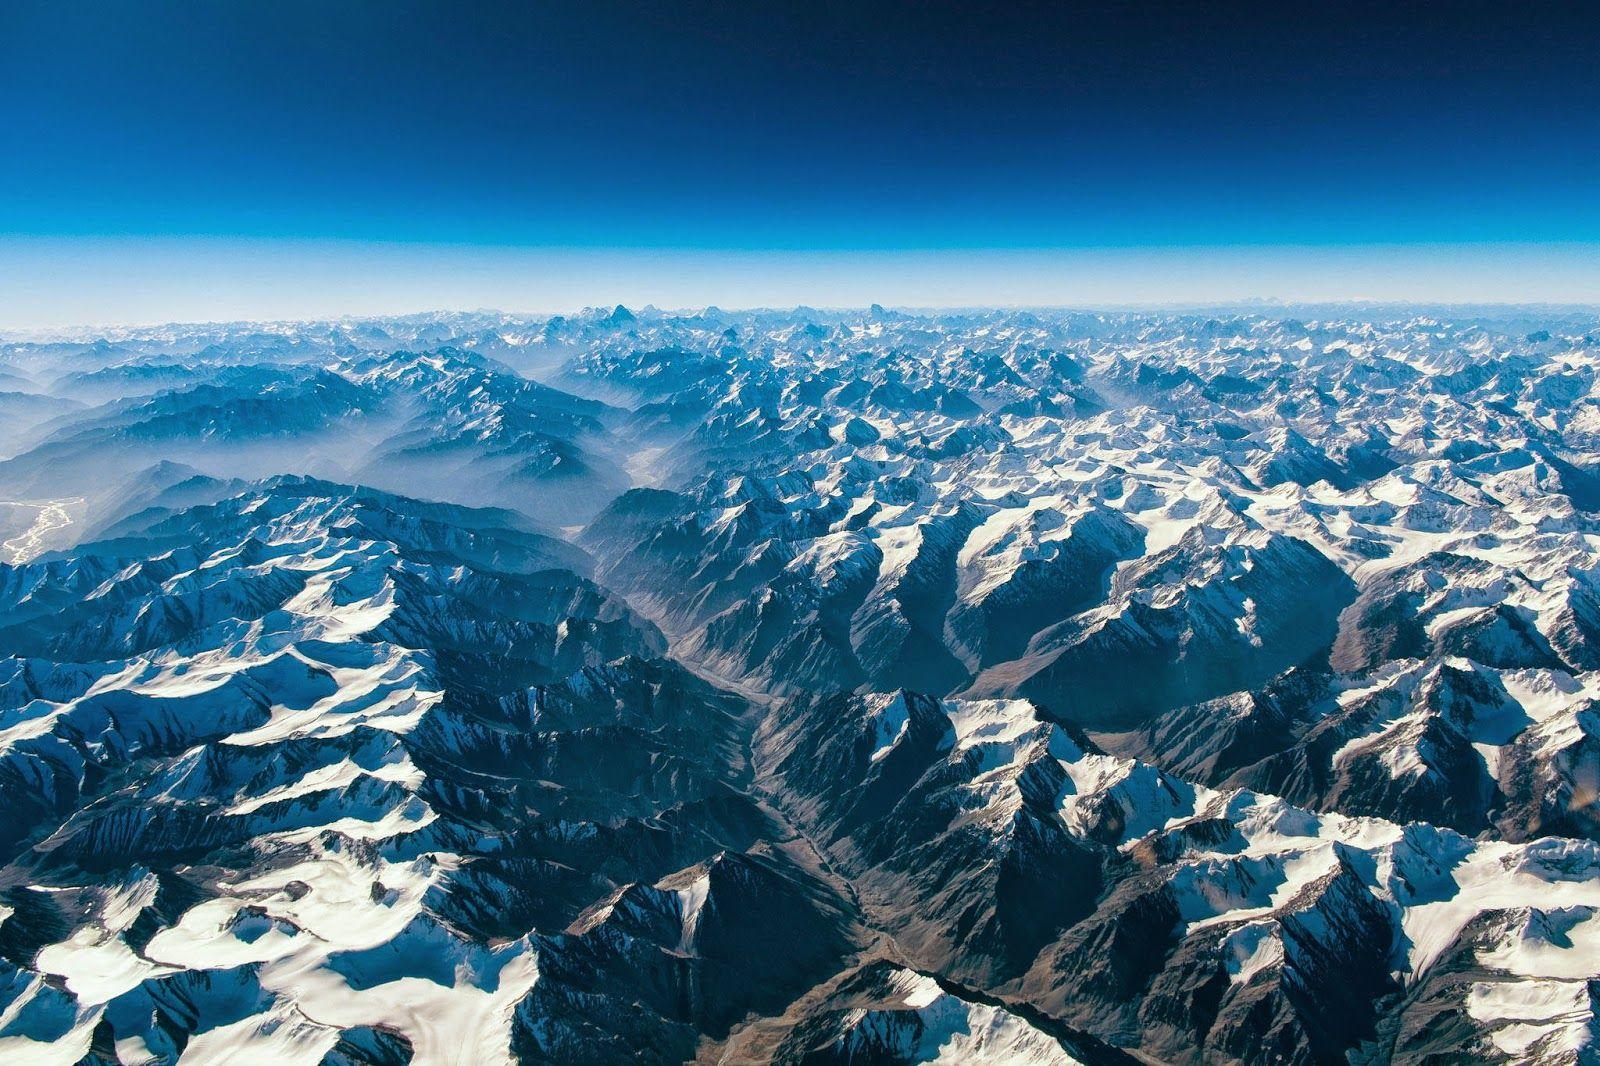 Sociolatte: High above the Himalayas